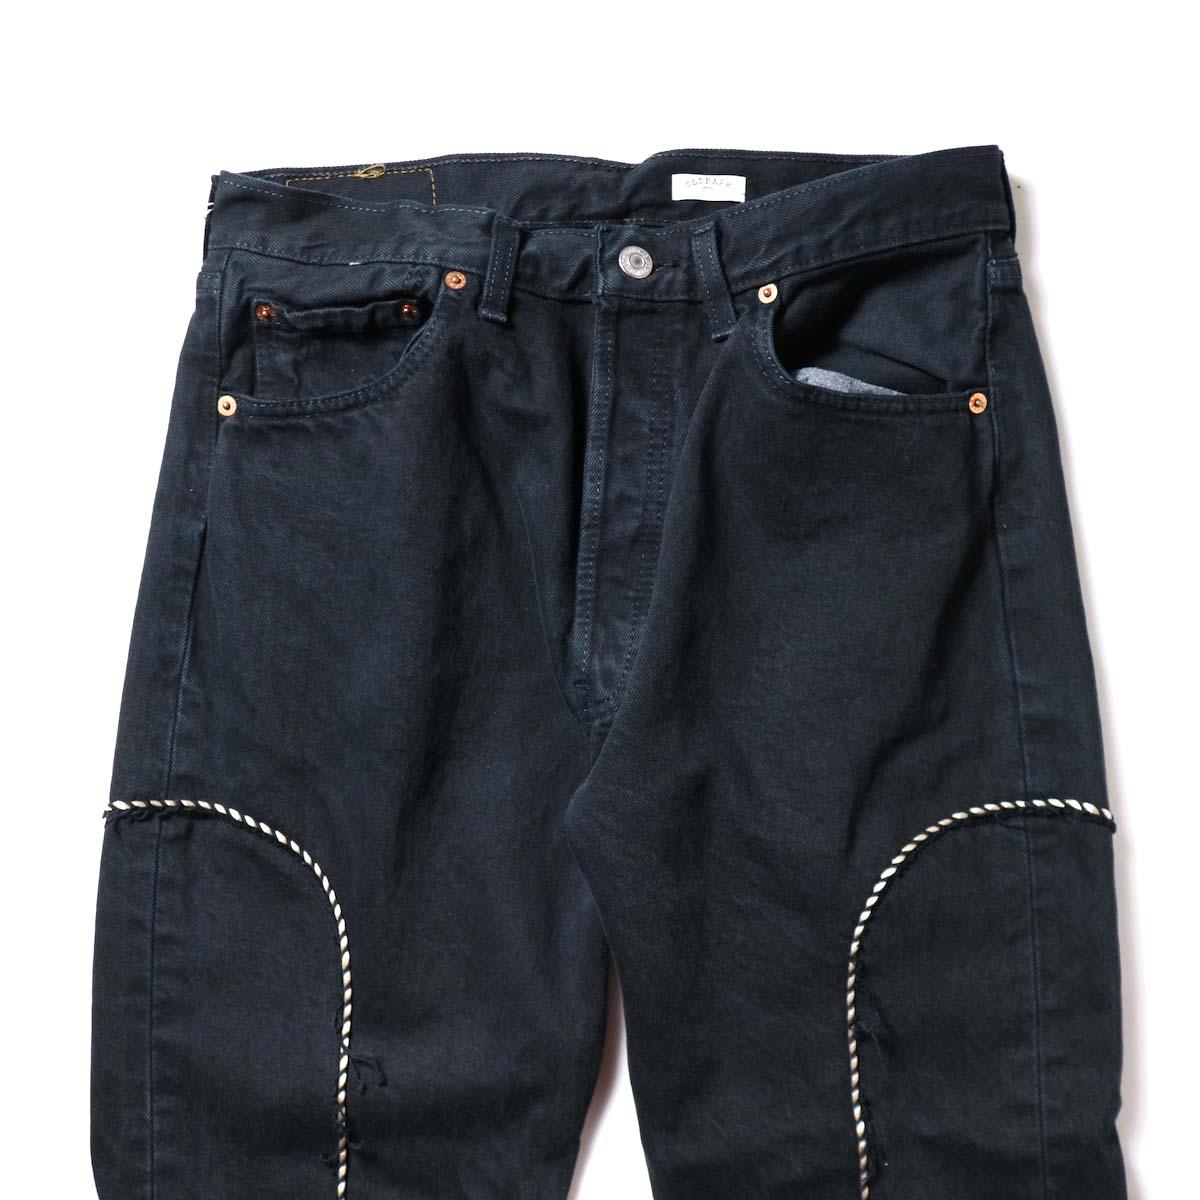 OLD PARK / Western Jeans Black (Msize-F)ウエスト